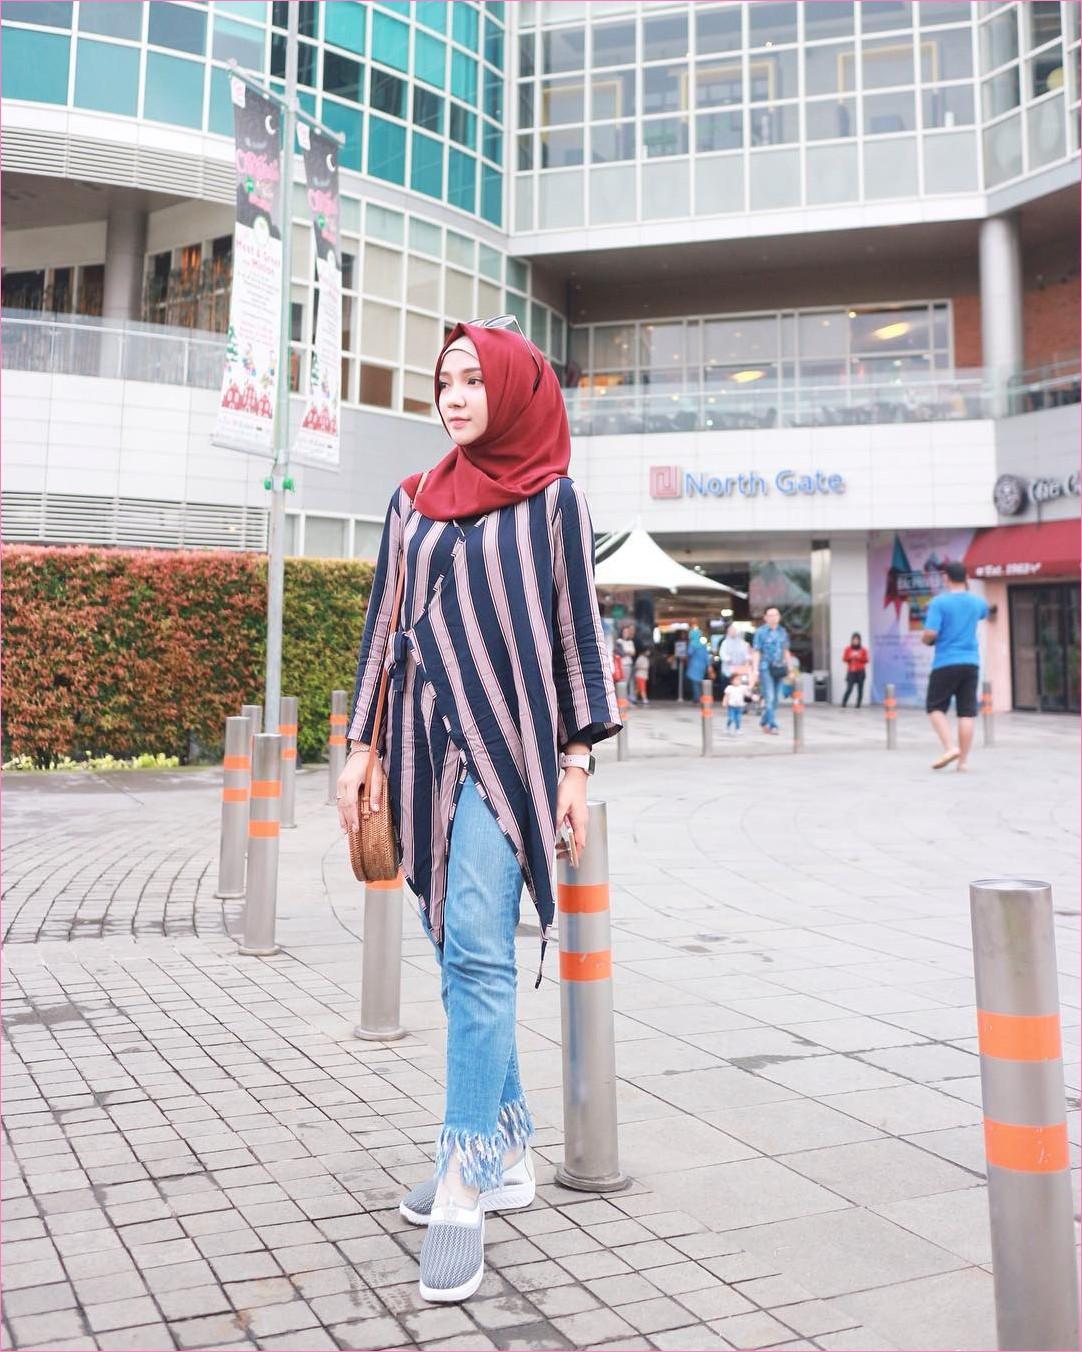 Outfit Celana Jeans Untuk Hijabers Ala Selebgram 2018 mangset hitam tunic outer stripe biru tua ungu slingbags rotan hijab pashmina diamond merah tua pants jeans denim sneakers kets lace ups abu jam tangan ootd trendy ciput